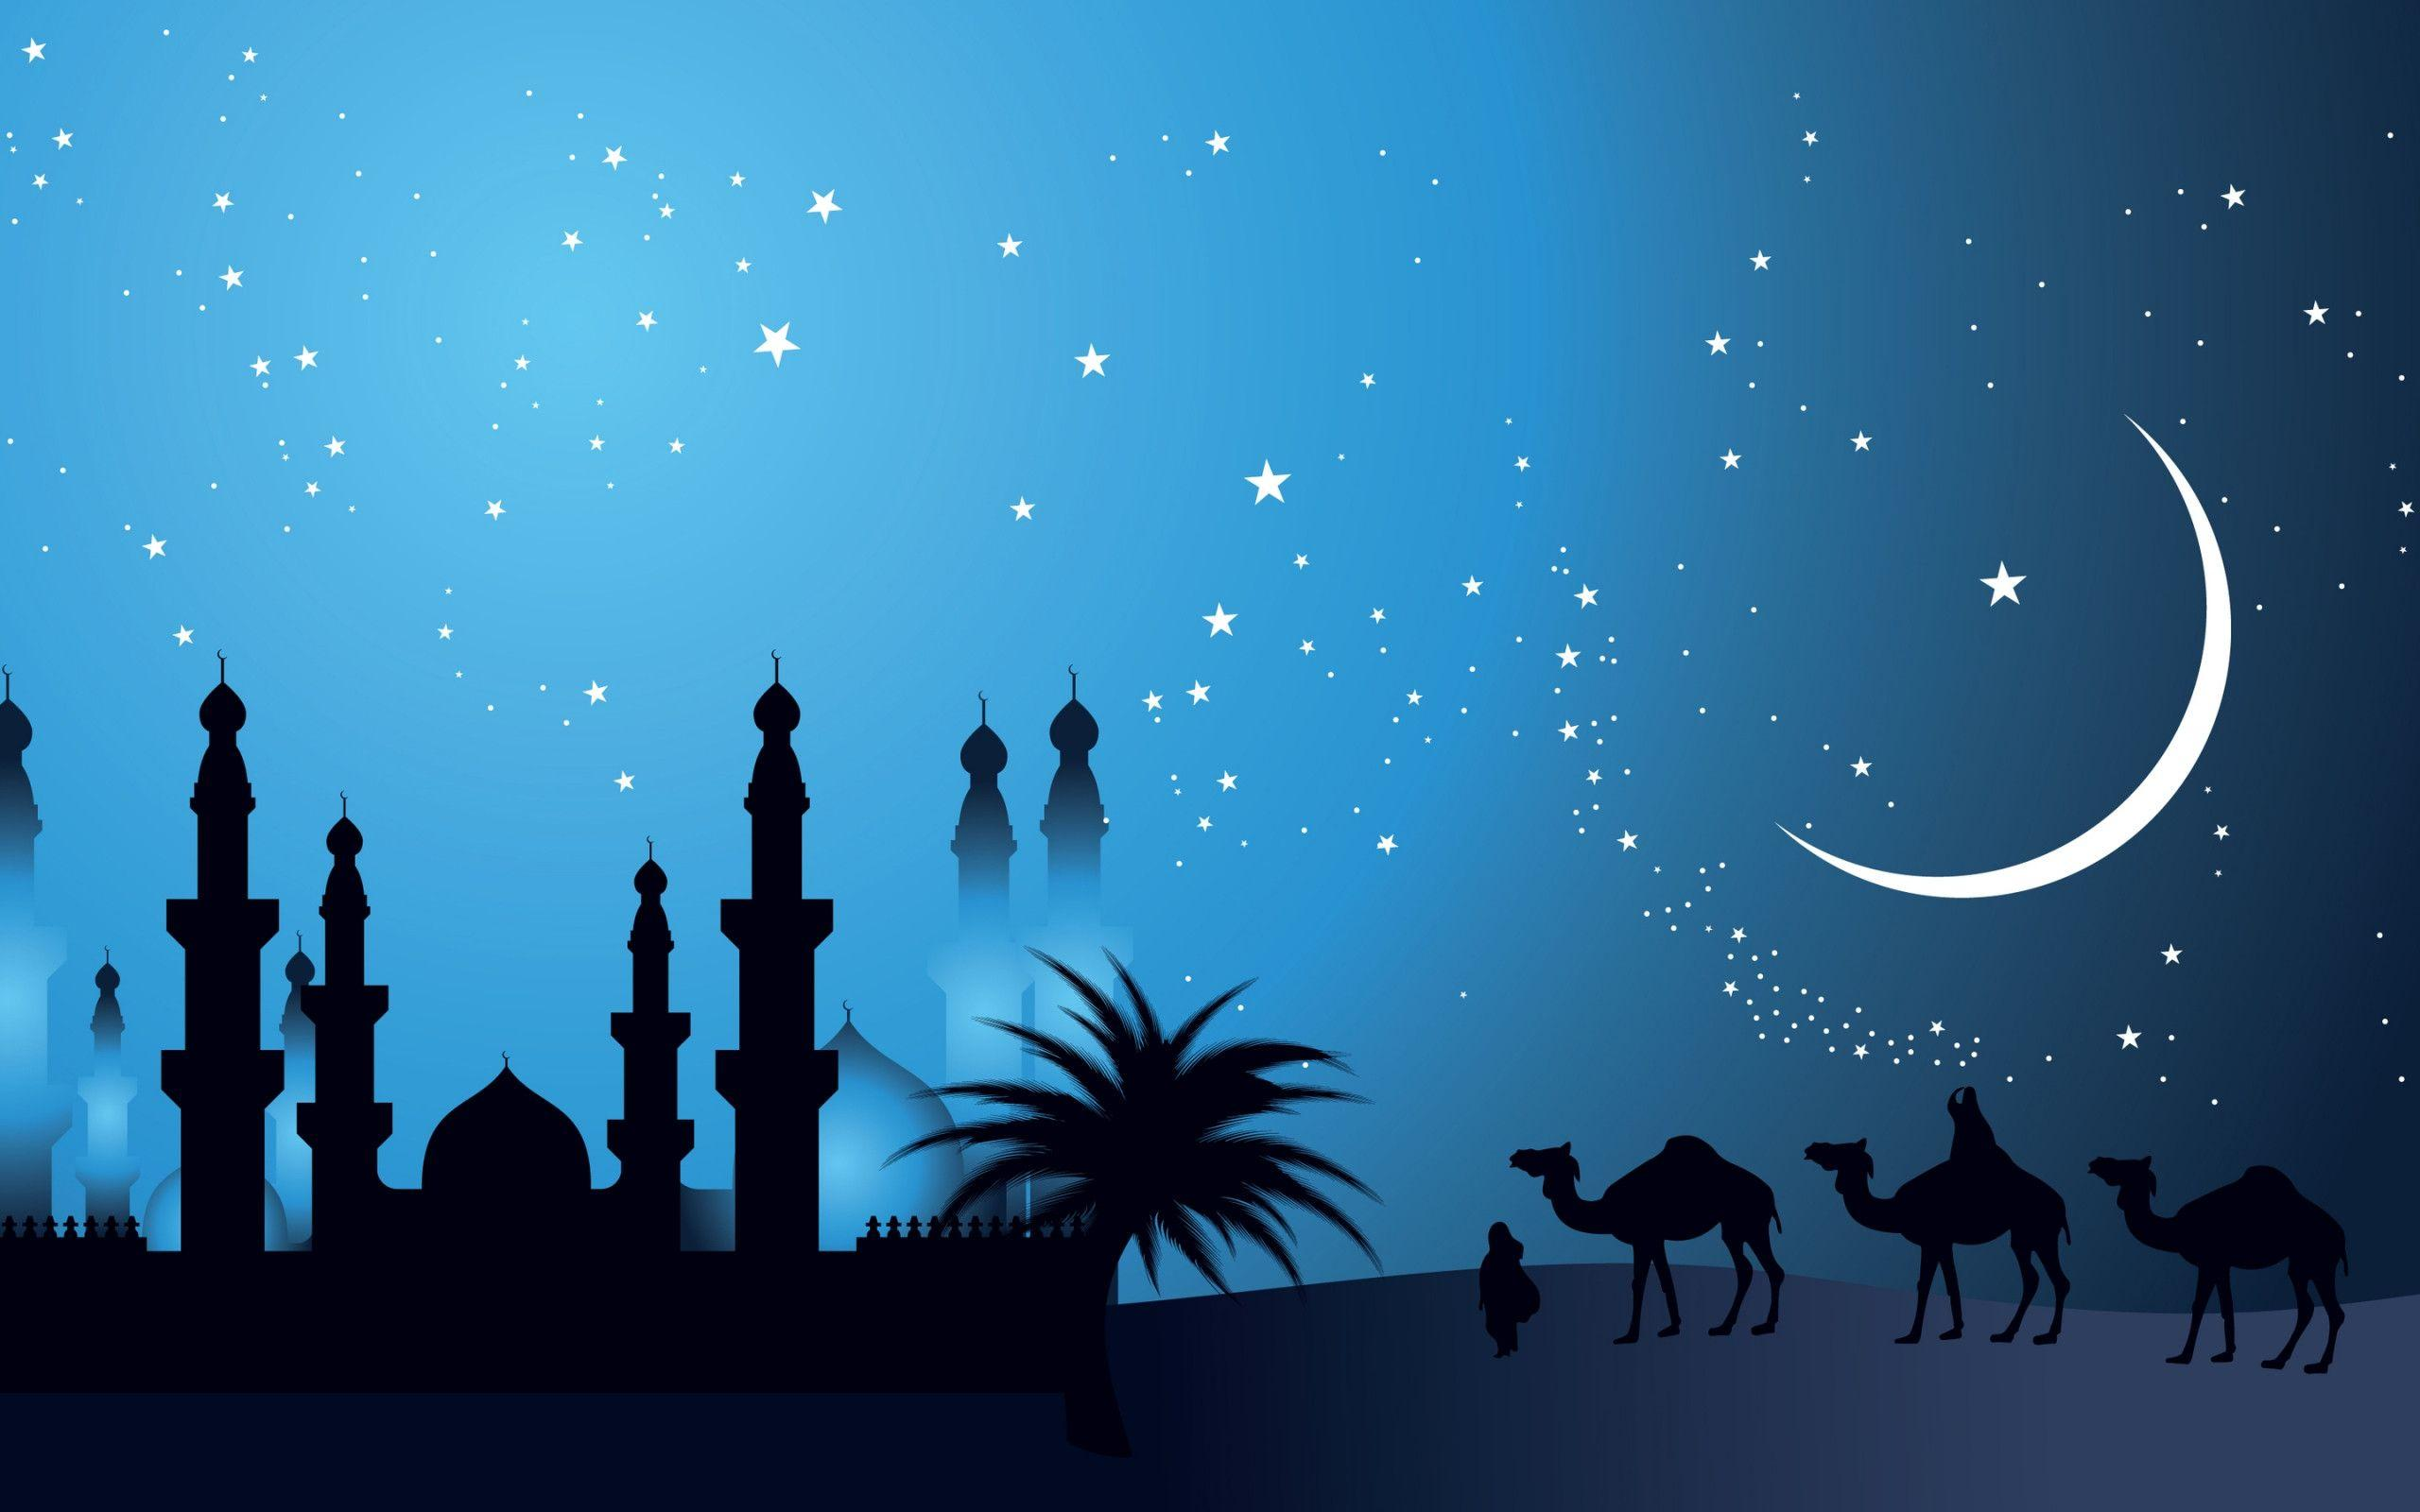 4k islamic wallpapers hd 4k, allah hd wallpapers, desktop wallpaper